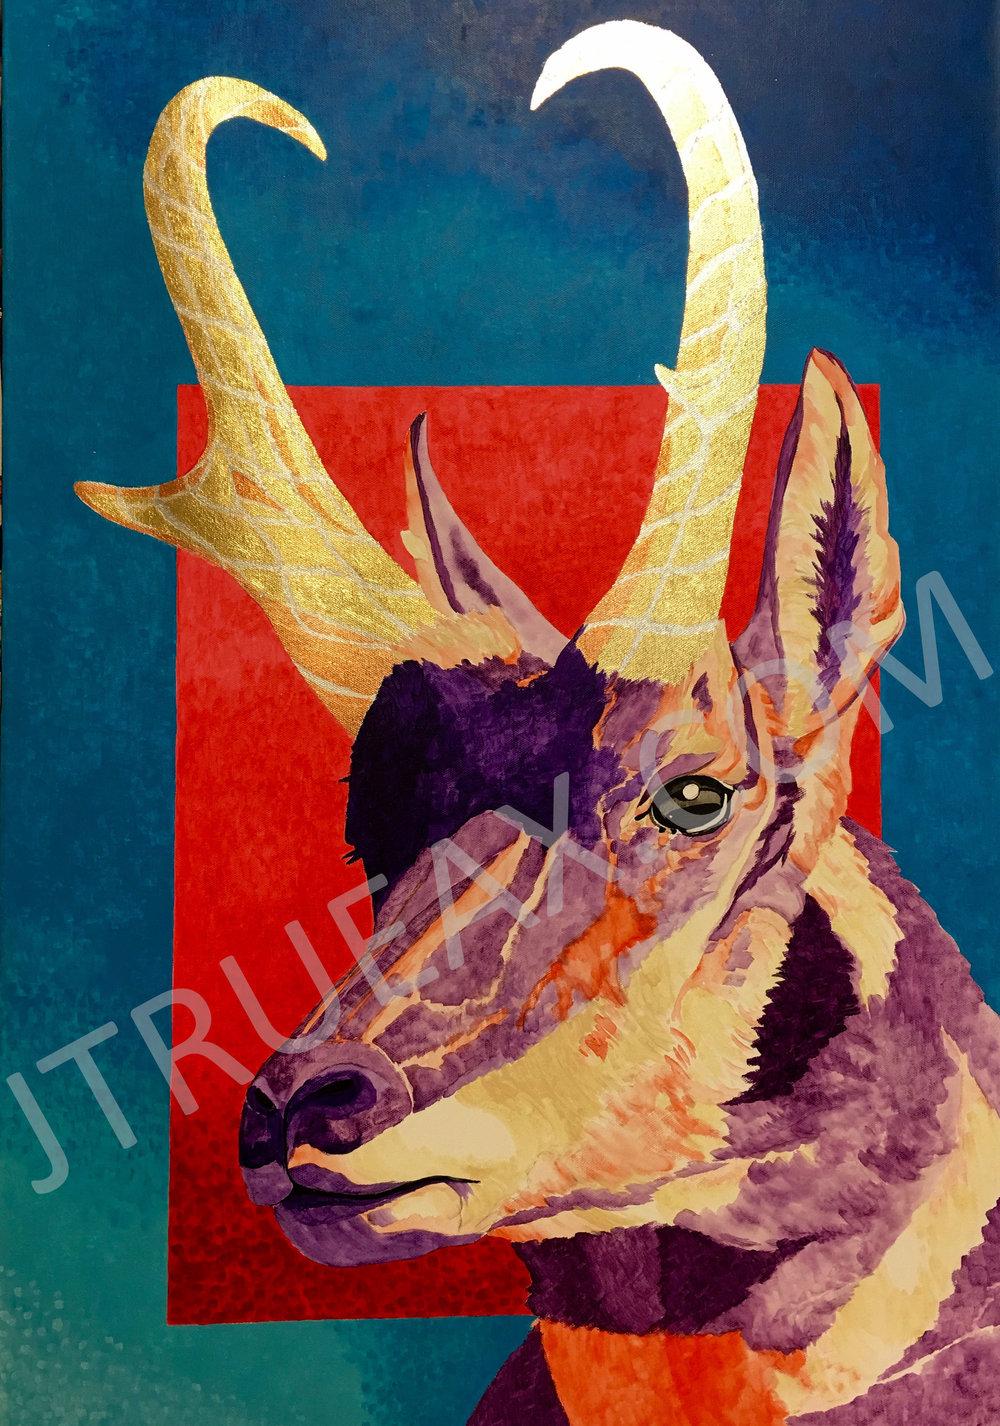 Prong Horn King